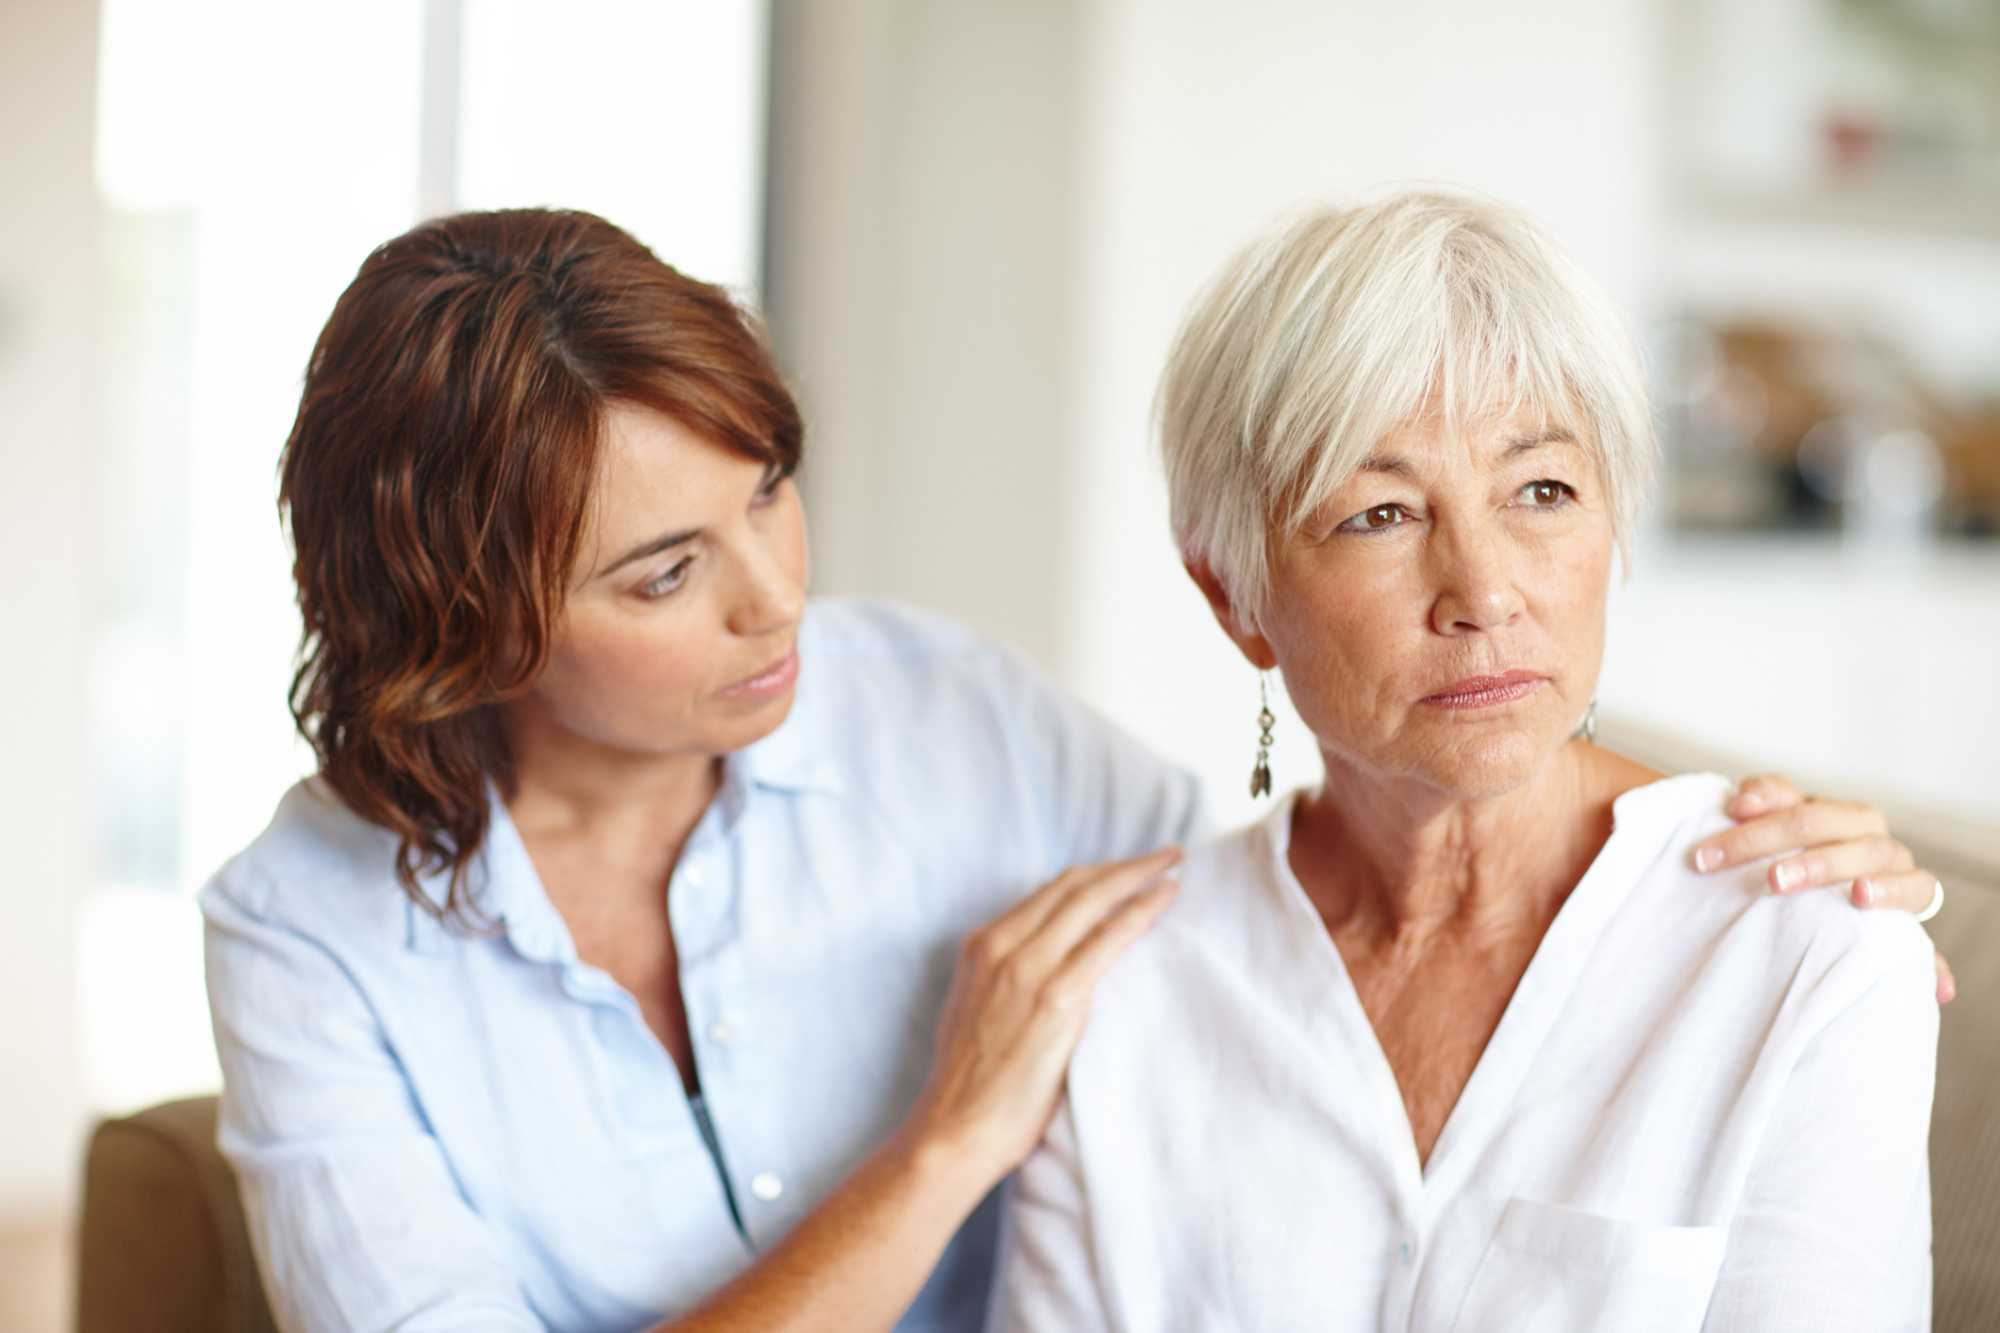 Luto para o idoso: saiba como ajudá-los nessa fase